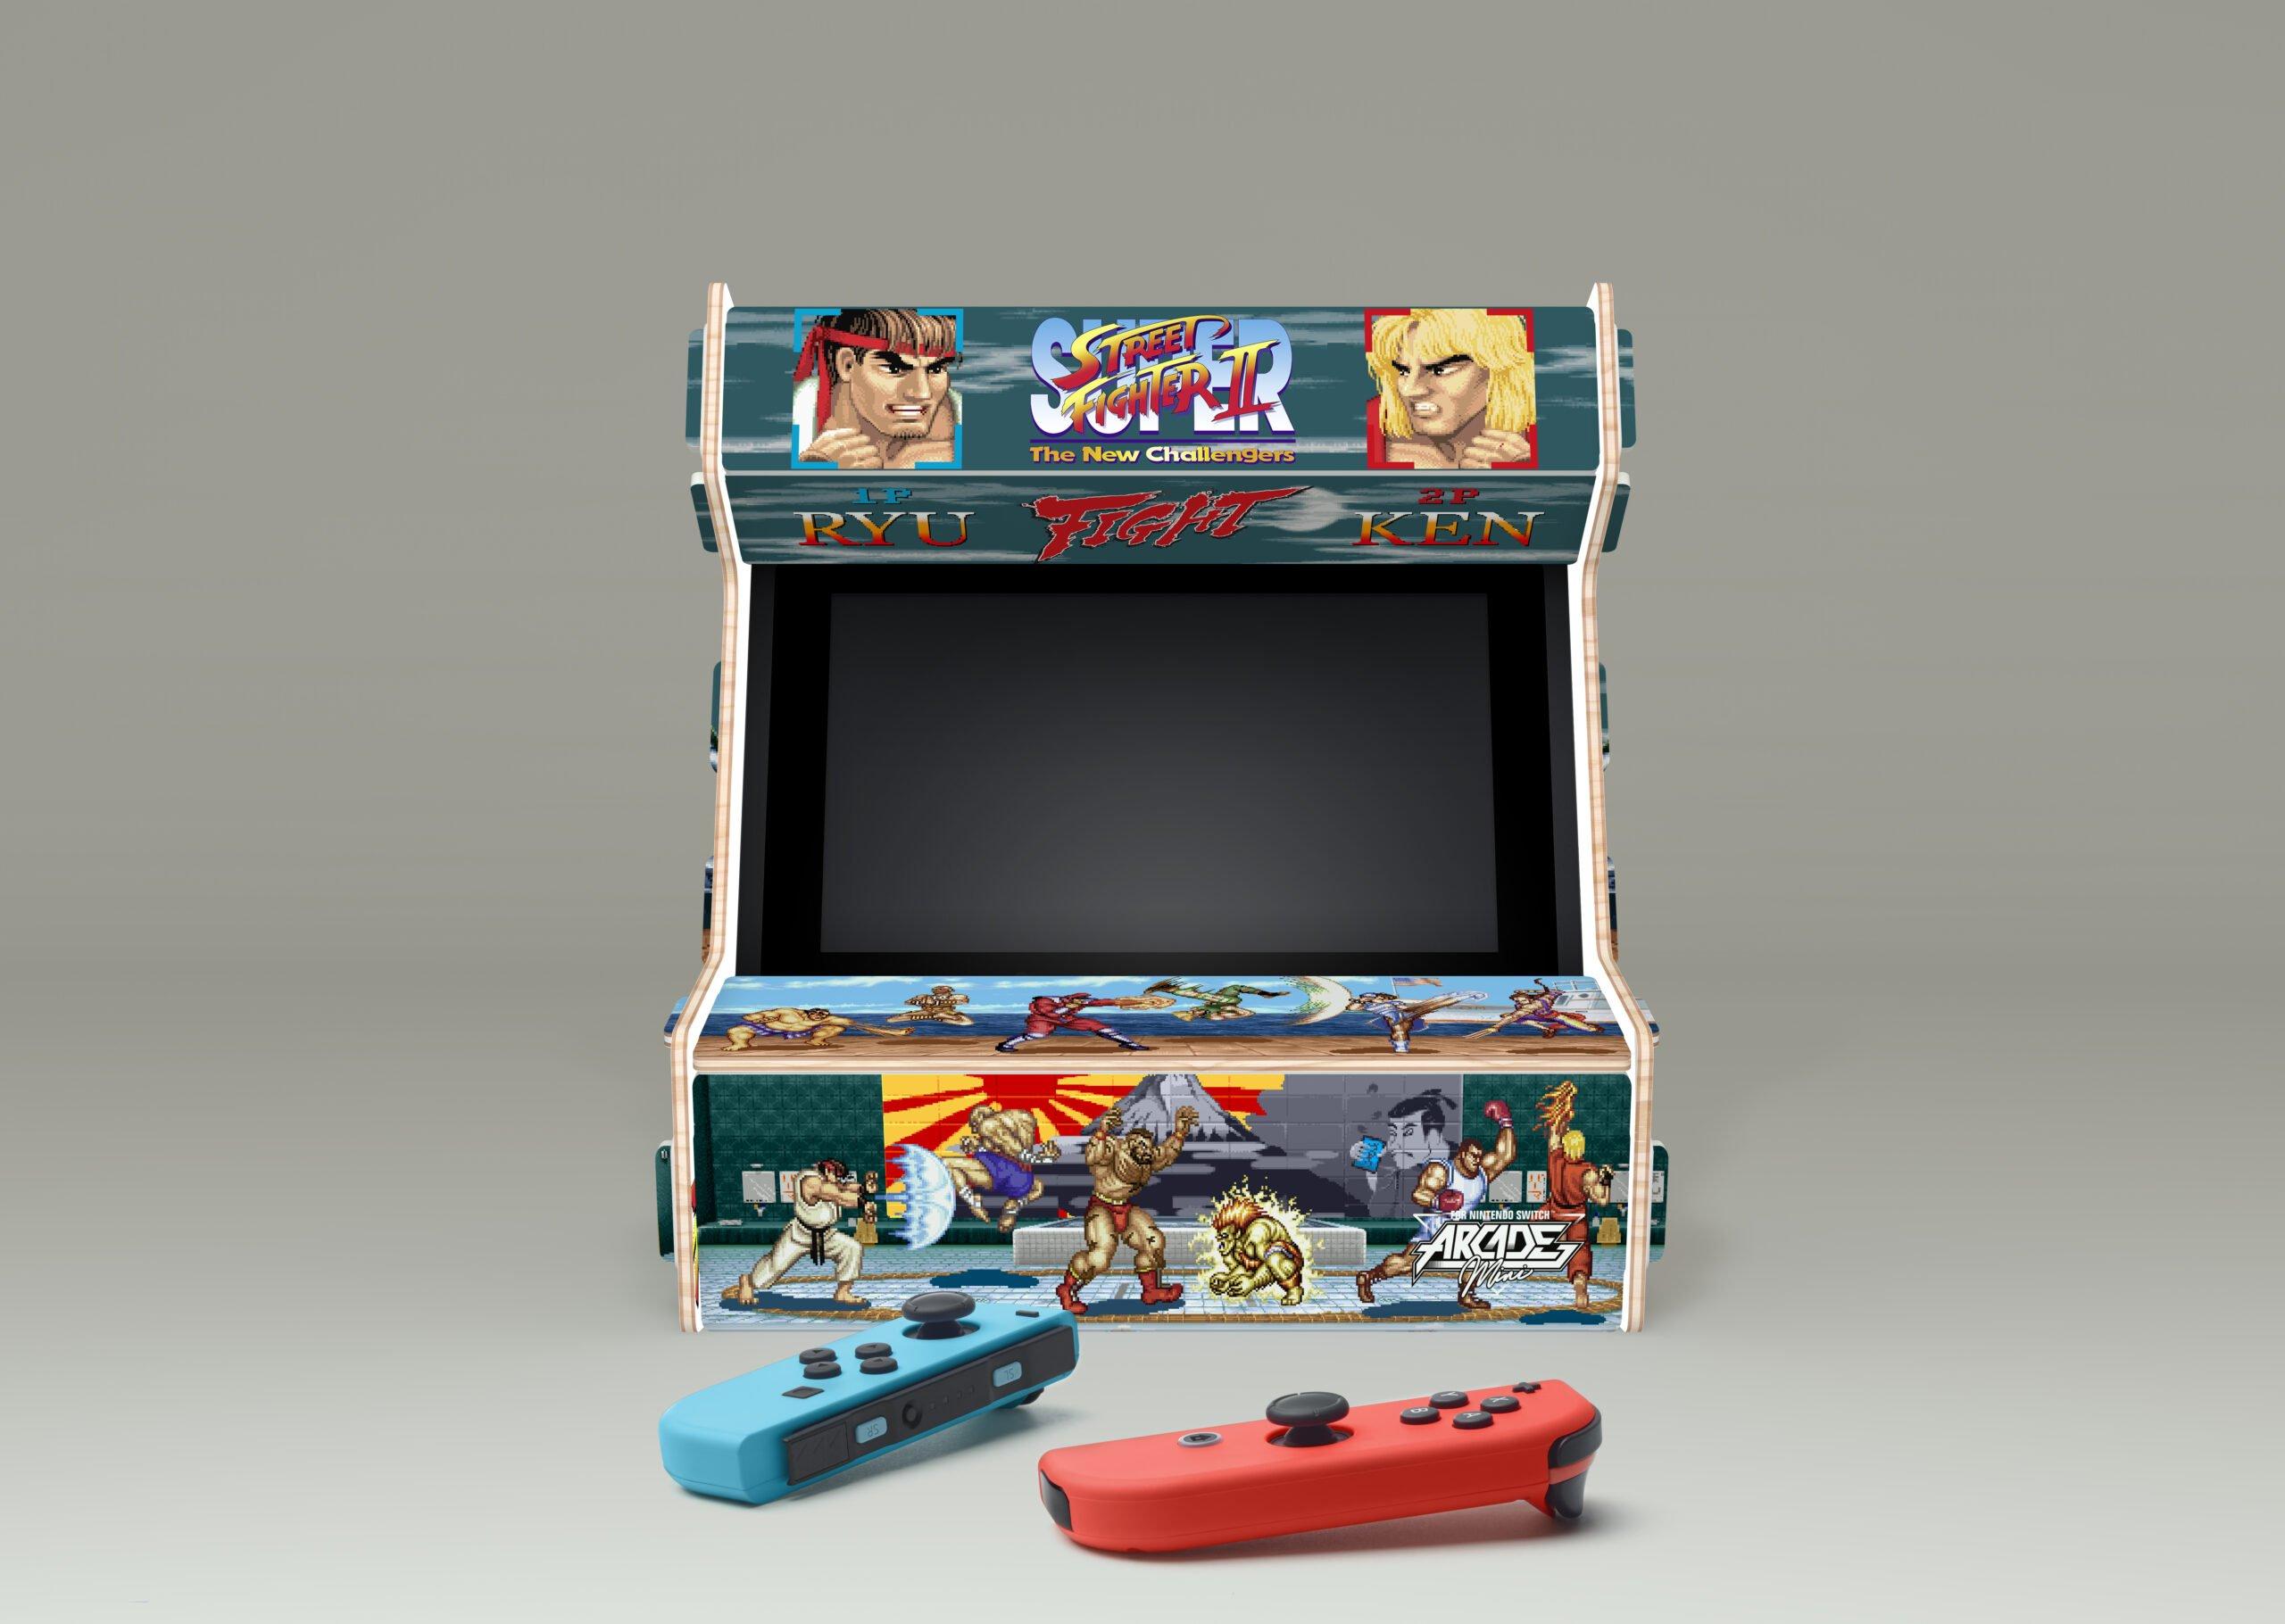 Borne Street Fighter II